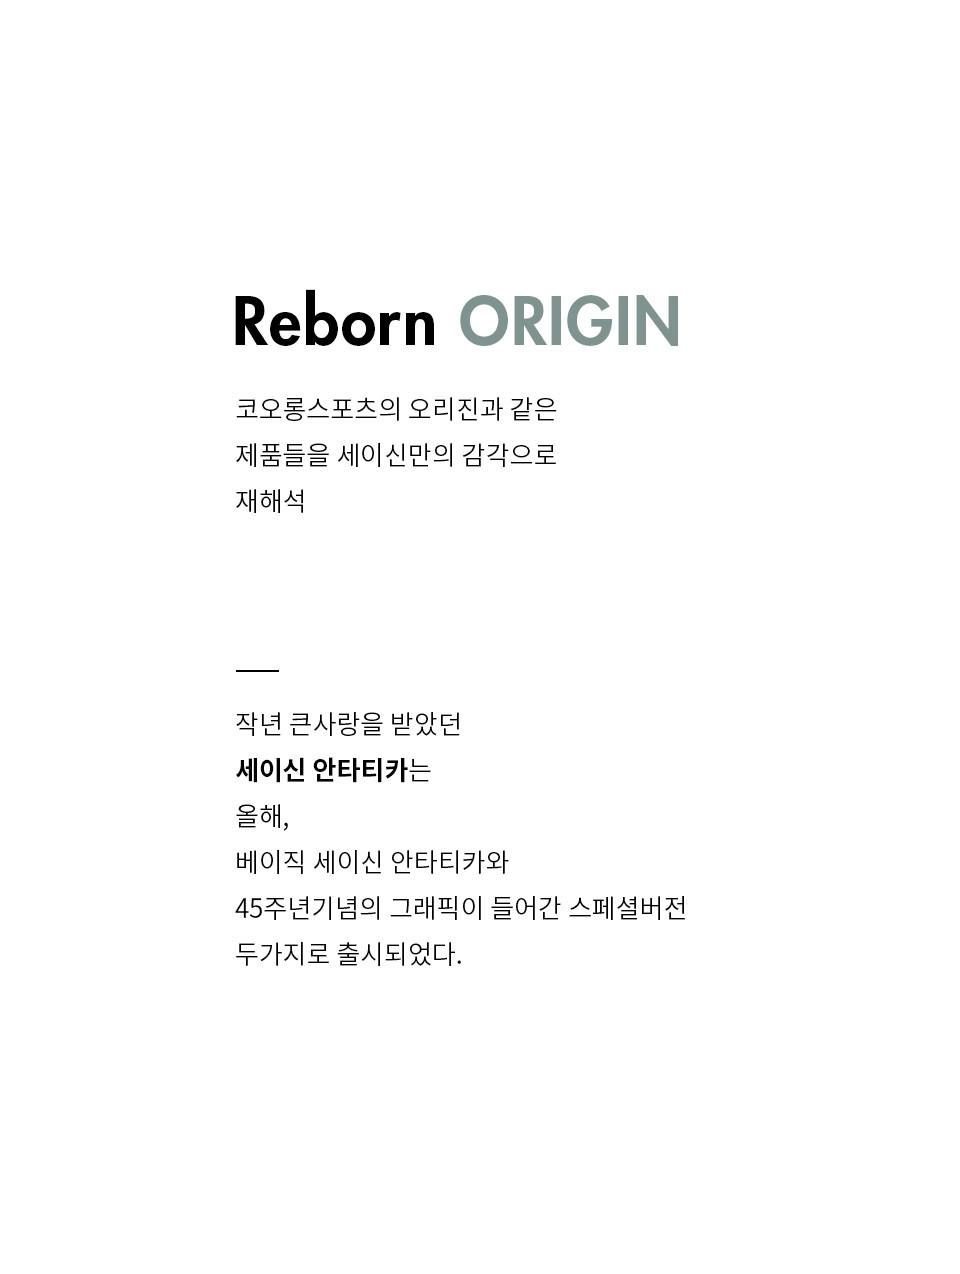 Reborn ORIGIN 코오롱스포츠의 오리진과 같은 제품들을 세이신만의 감각으로 재해석 작년 큰사랑을 받았던 세이신 안타티카는 올해, 베이직 세이신 안타티카와 45주년기념의 그래픽이 들어간 스페셜버전 두가지로 출시되었다.